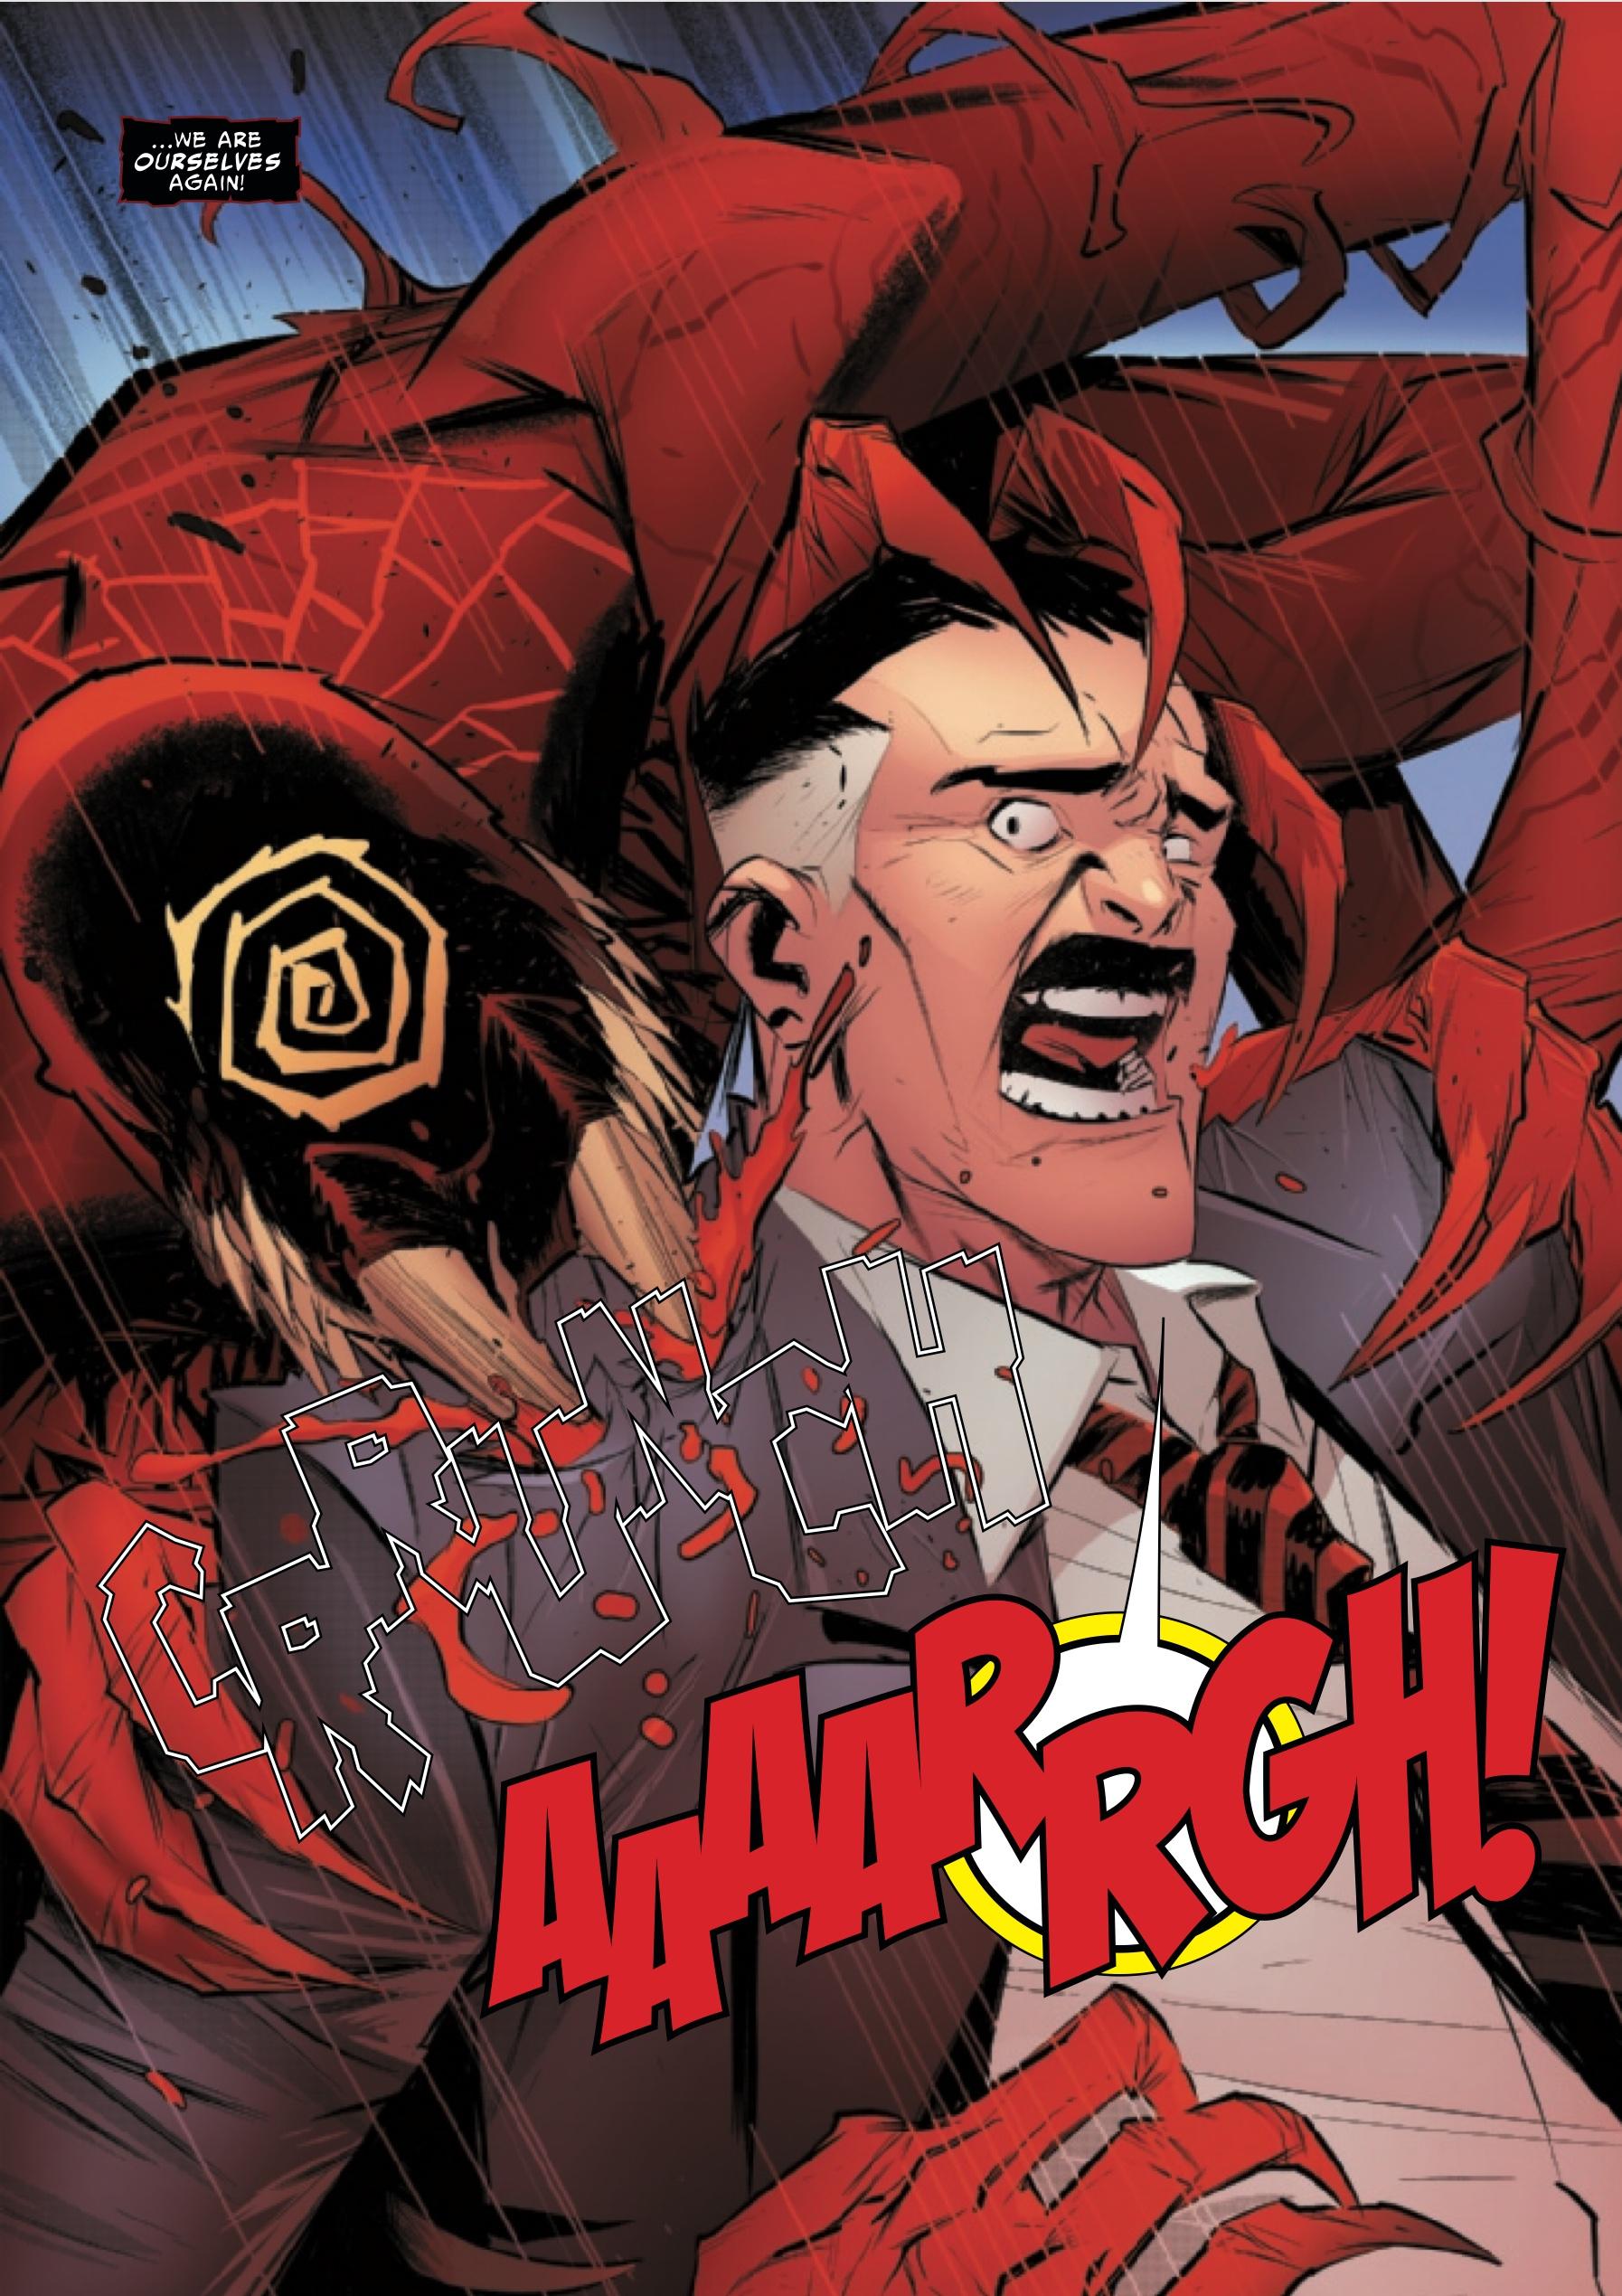 Miles Morales' Venom form is trying to murder J. Jonah Jameson